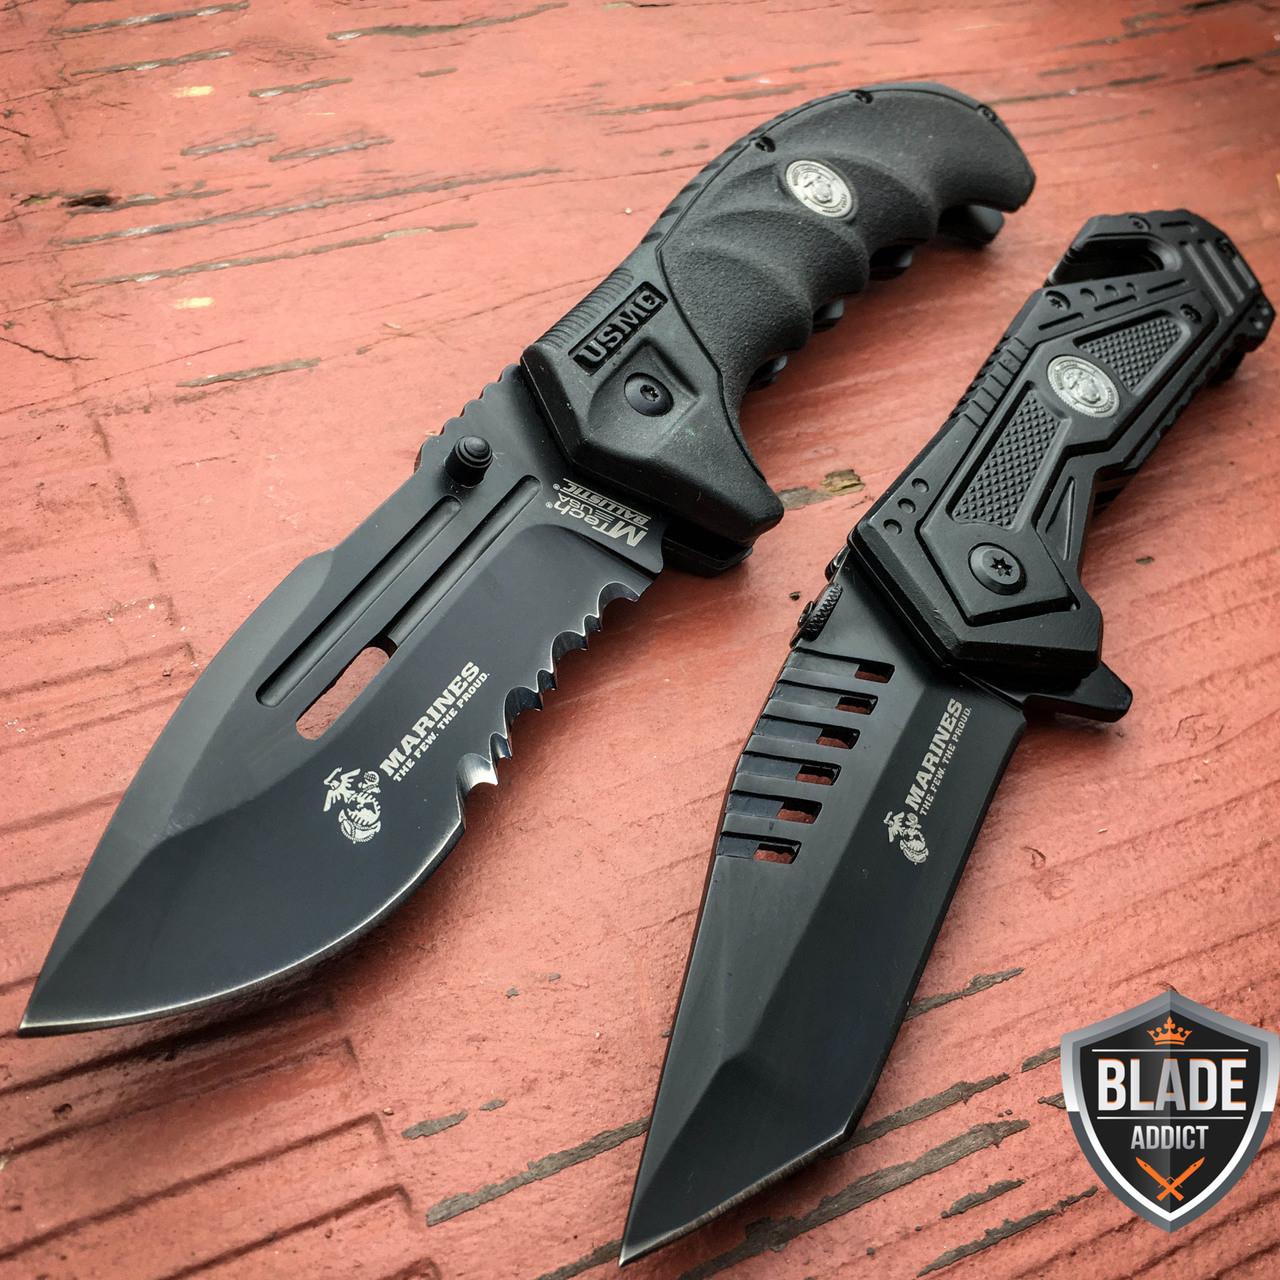 2PC USMC MARINES TACTICAL SPRING ASSISTED FOLDING KNIFE Blade Pocket Open